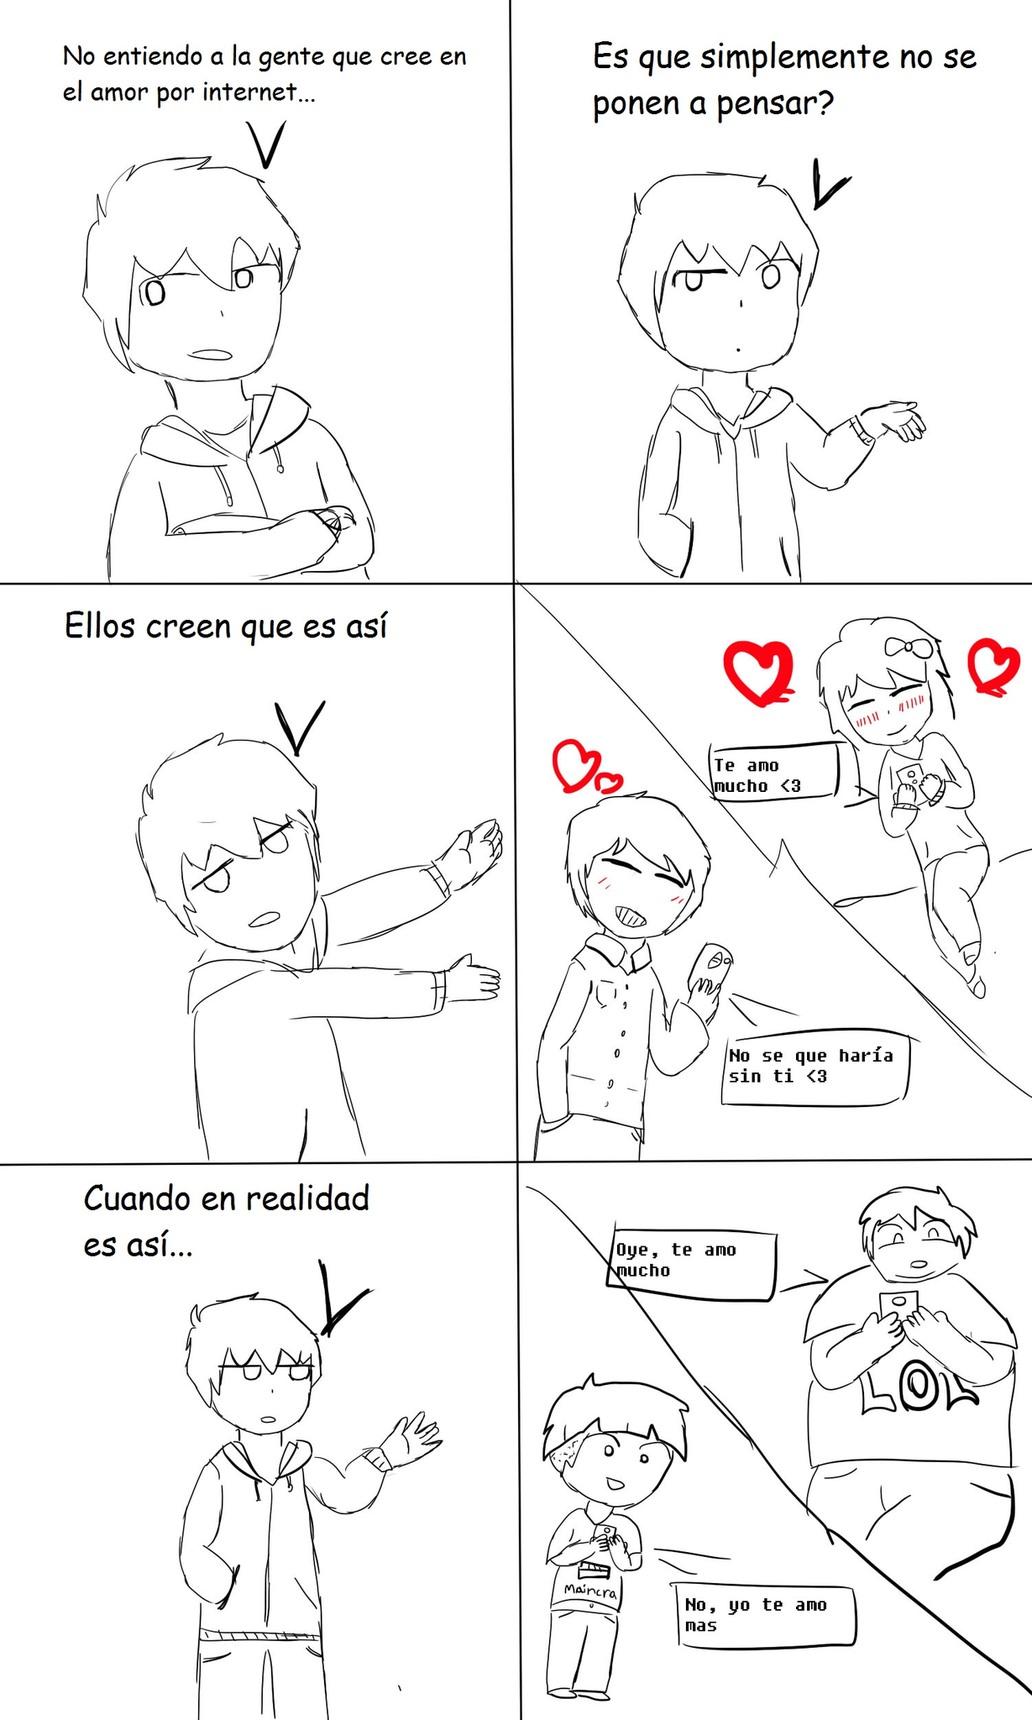 Amoríos por internet. jota pe ge - meme